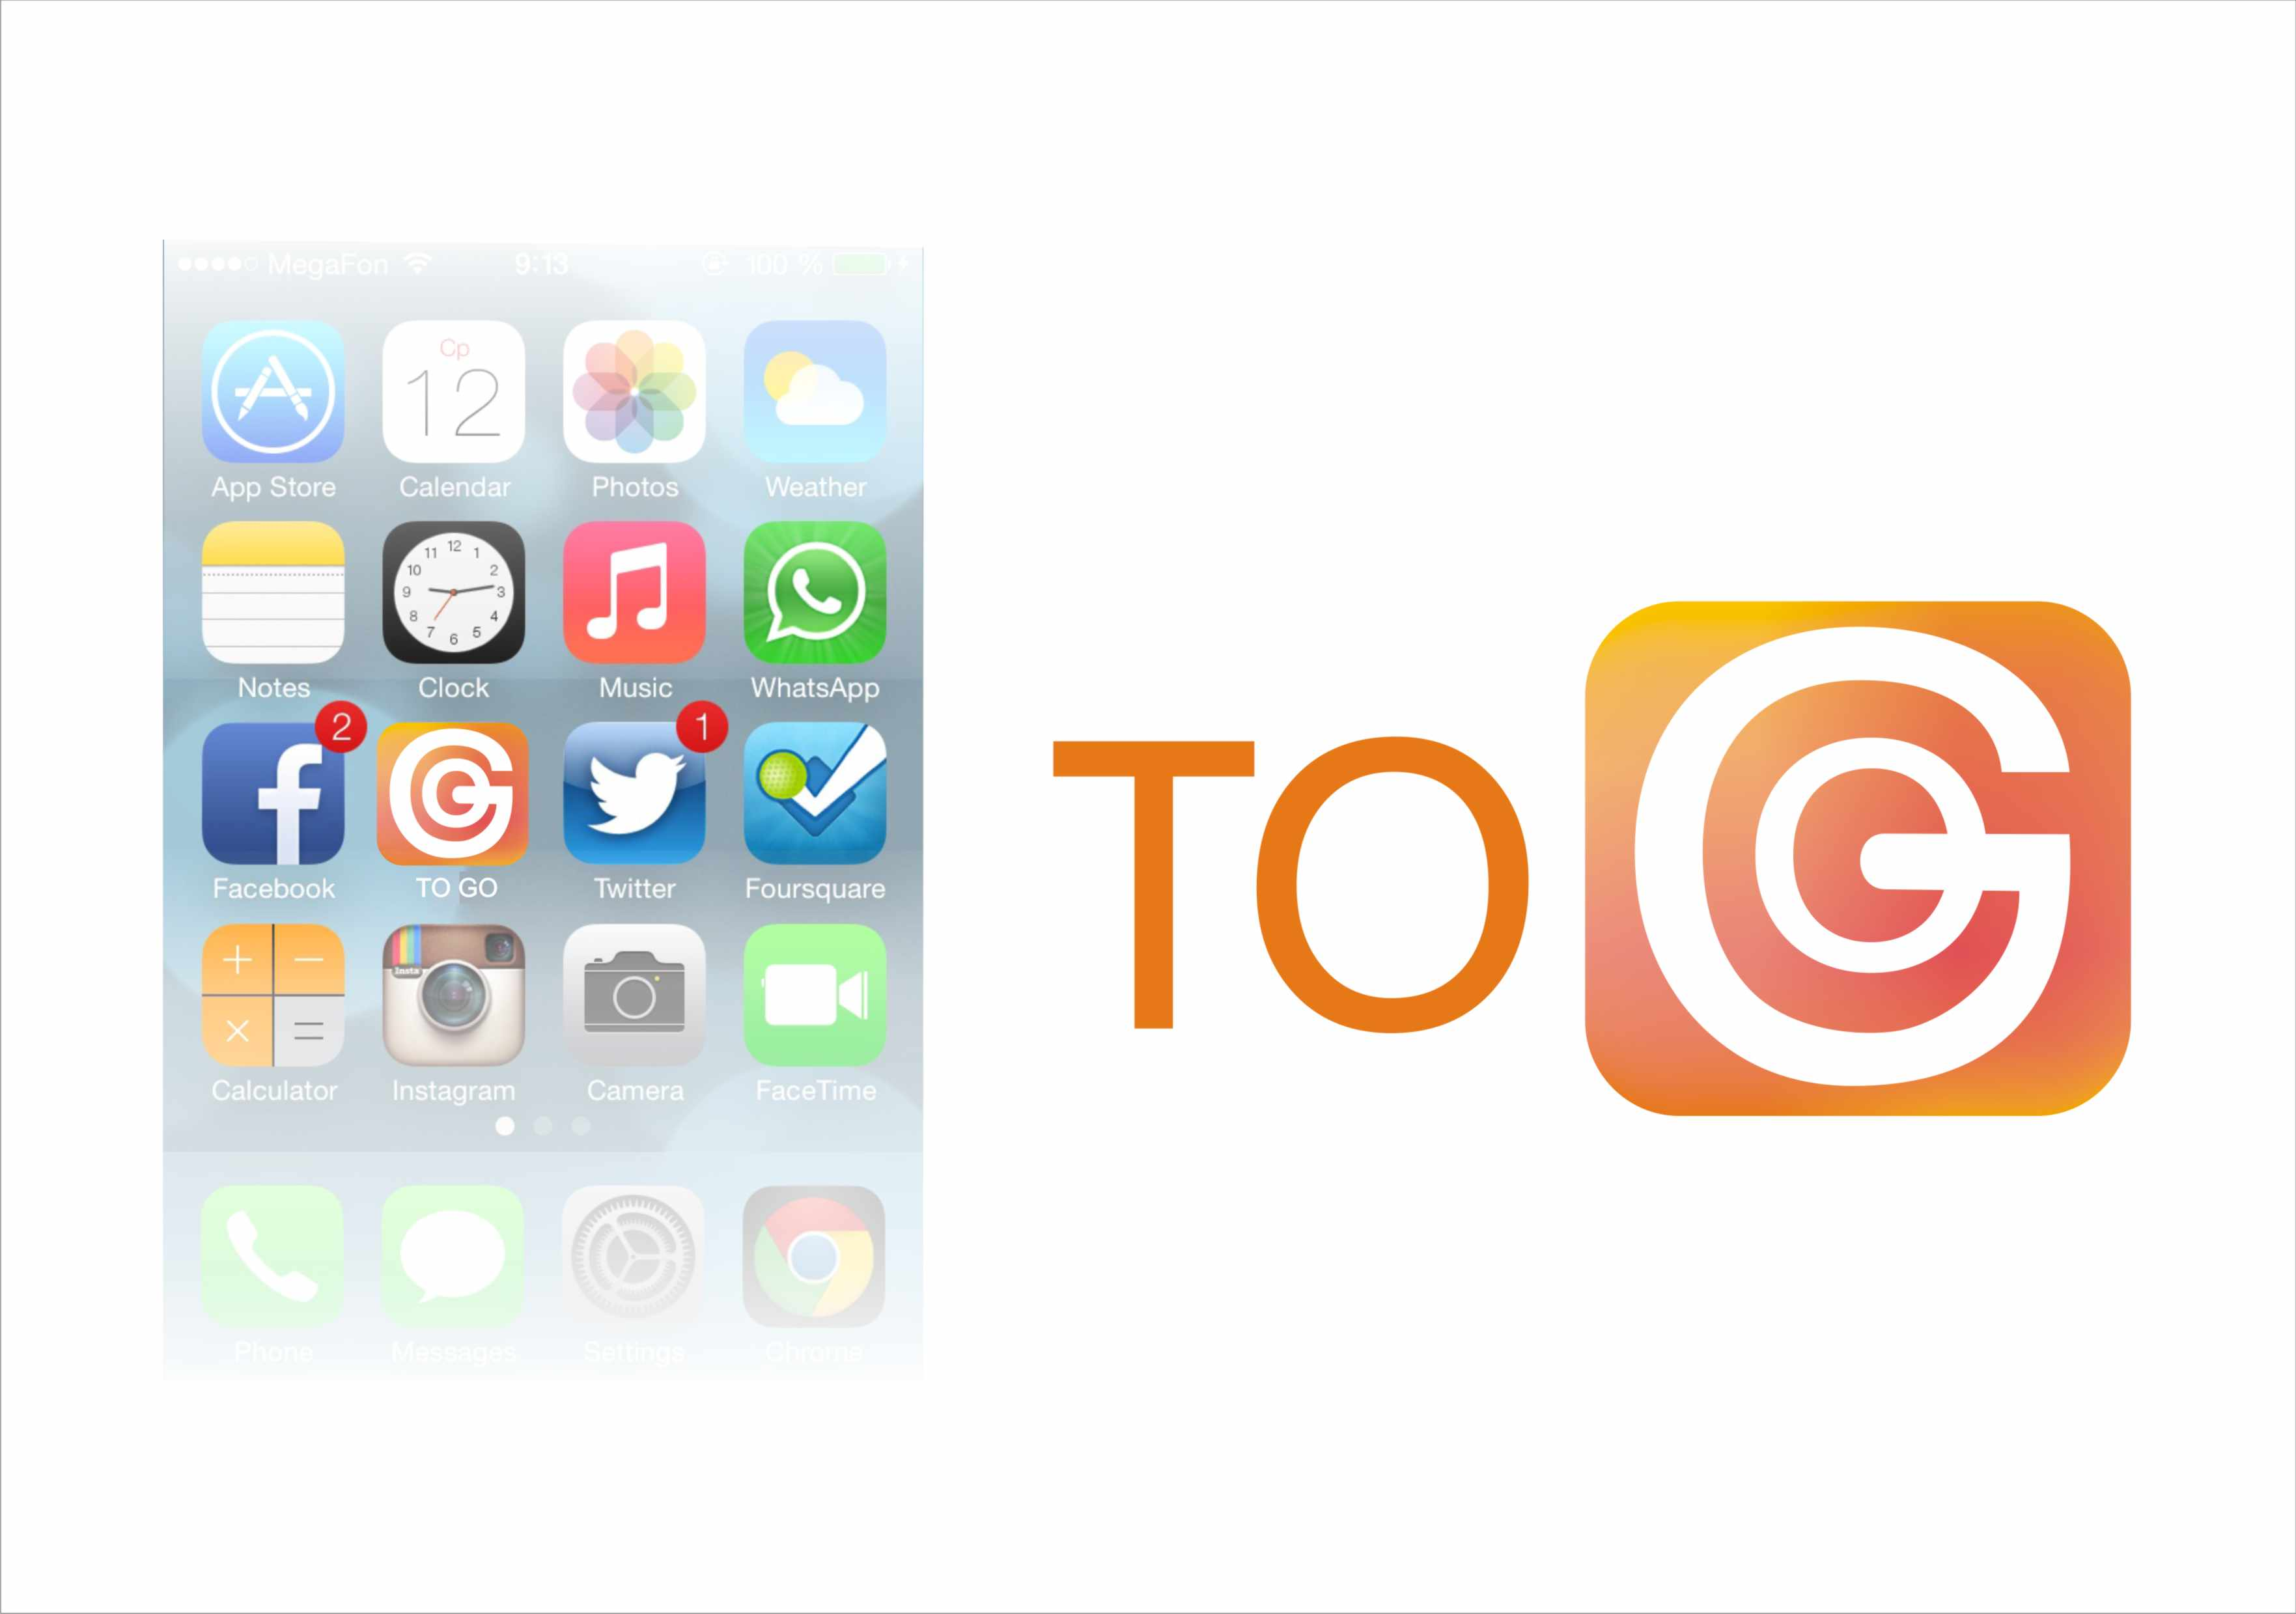 Разработать логотип и экран загрузки приложения фото f_3855a83fc9d77bad.jpg